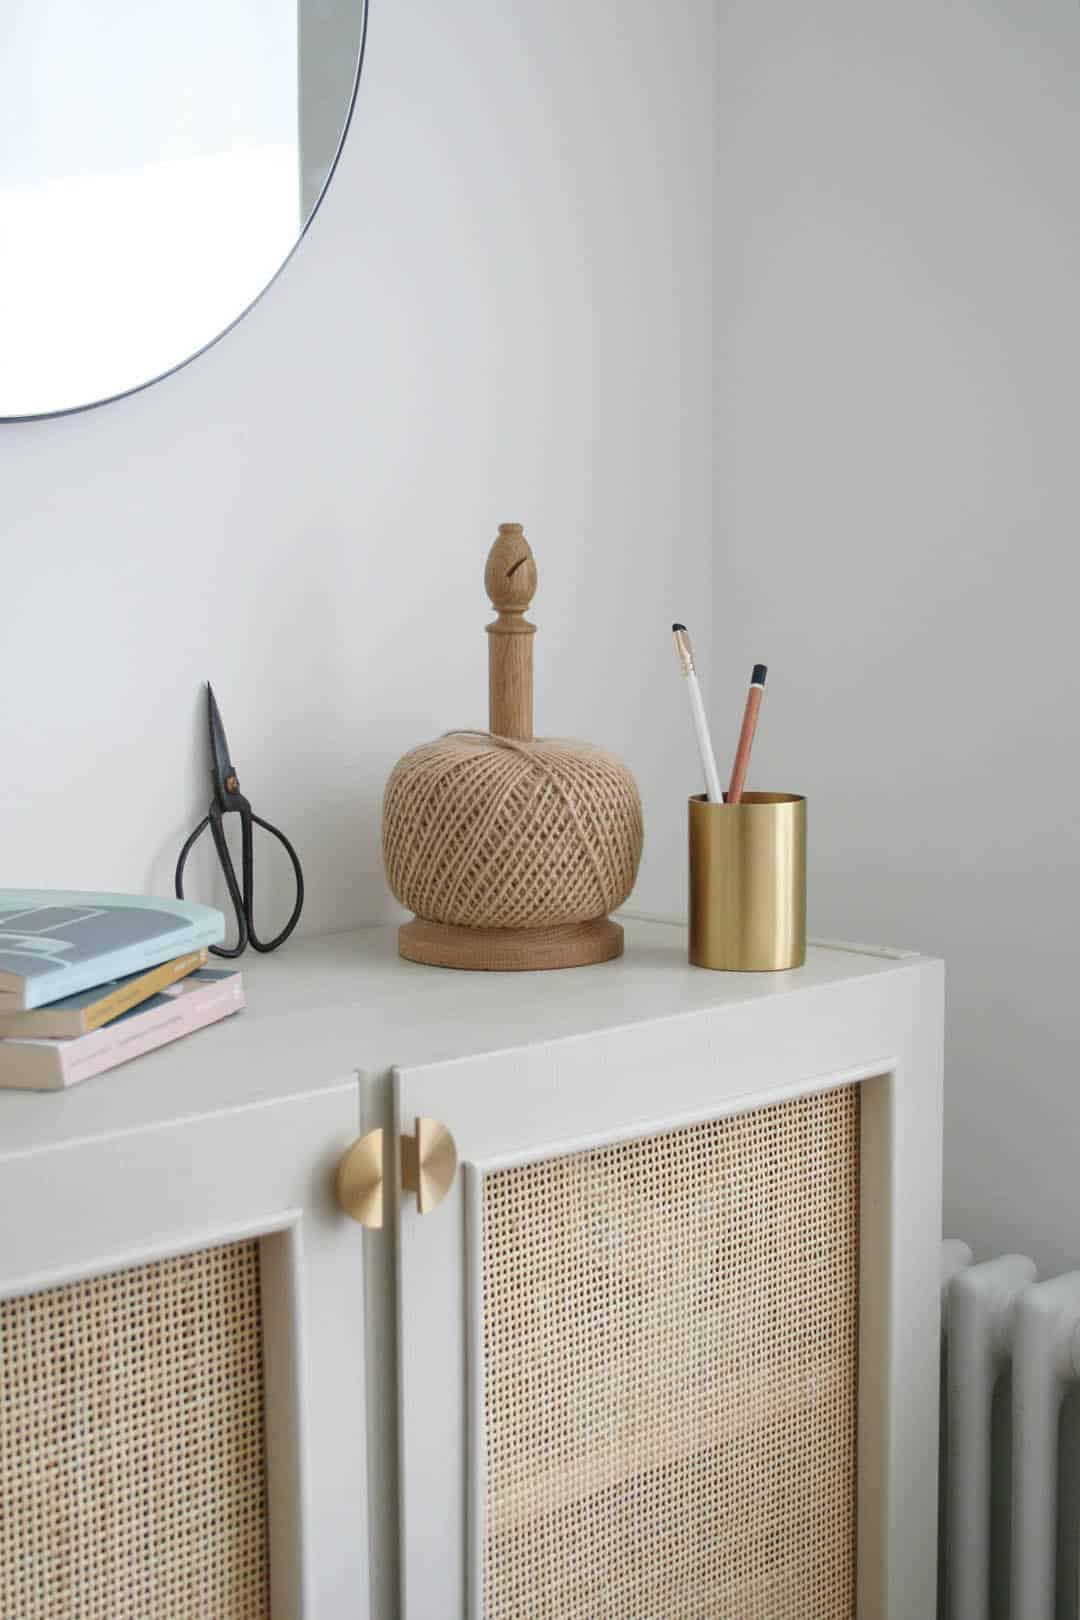 11 Ikea Rattan Cane Hacks That Are So Beautiful Stylish Make Calm Lovely